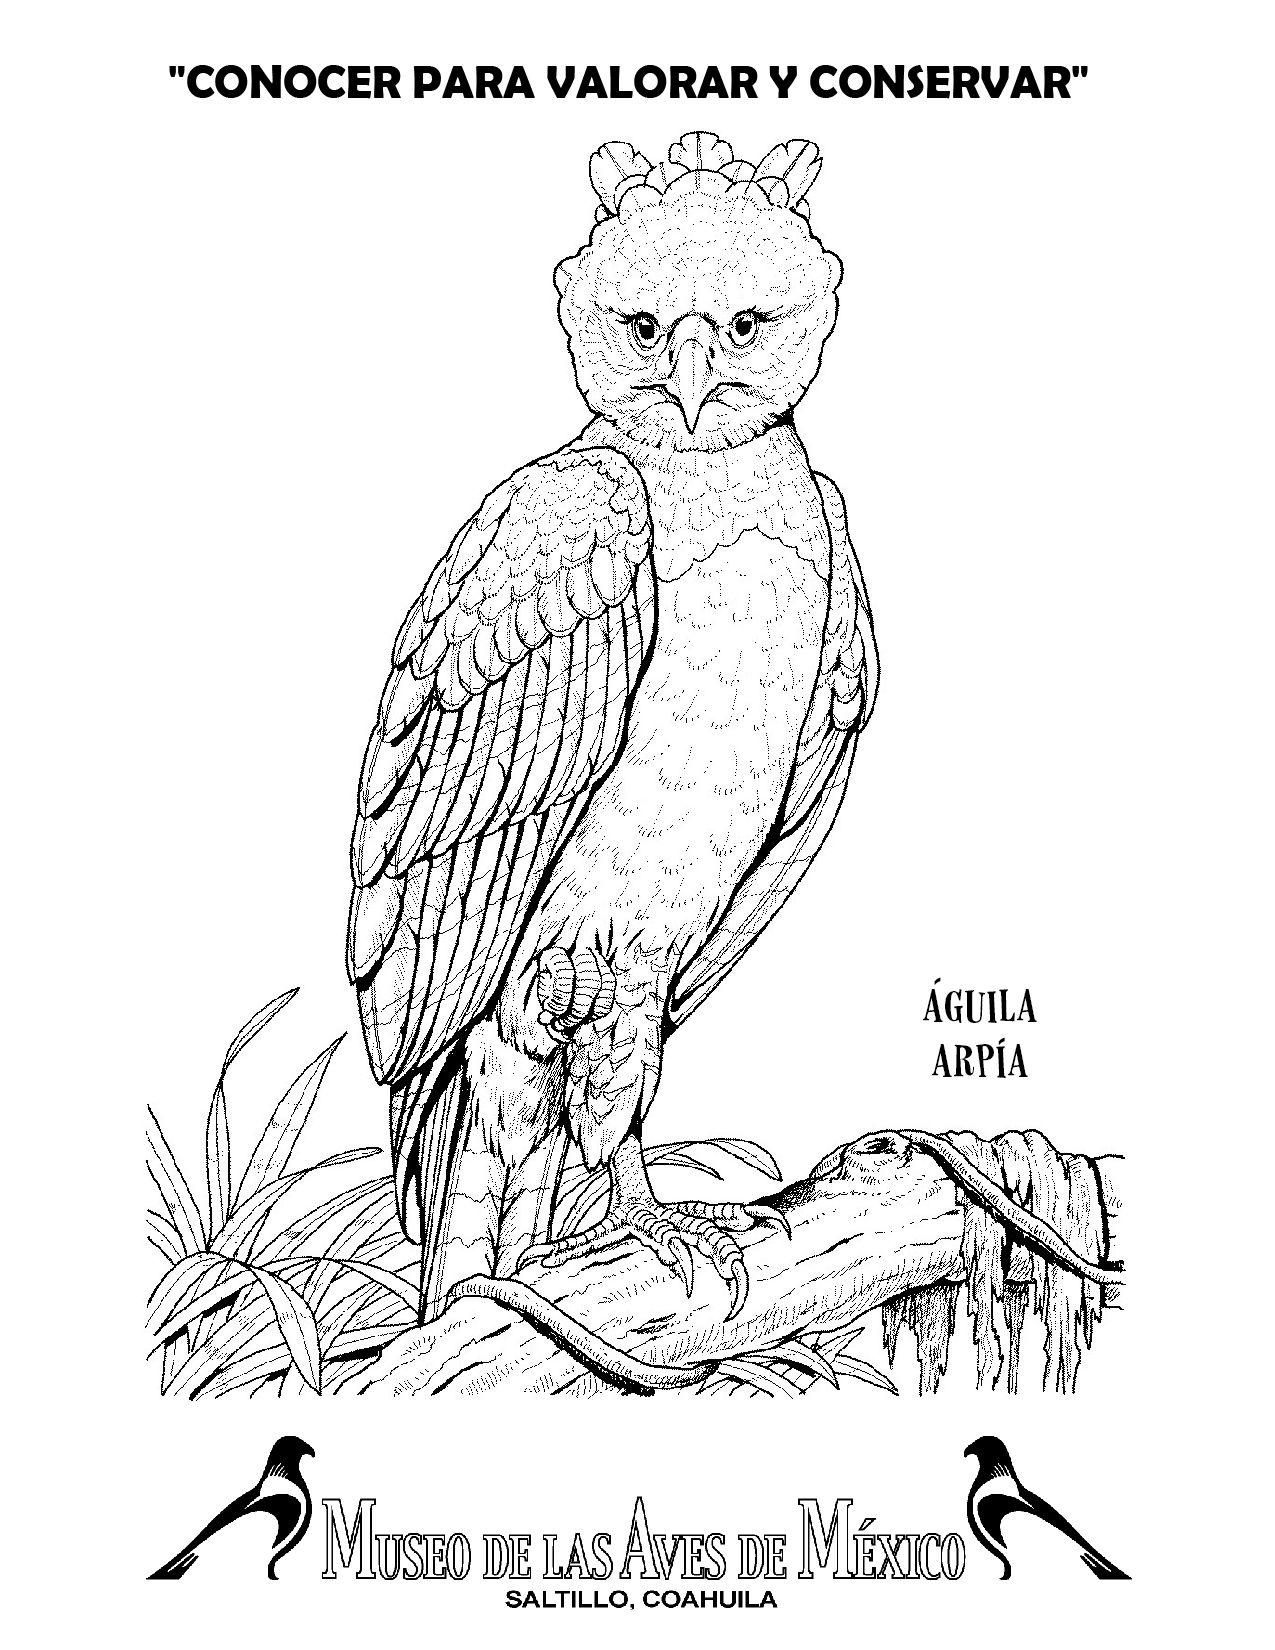 guila arpa descarga imprime pinta museo de las aves de mxico